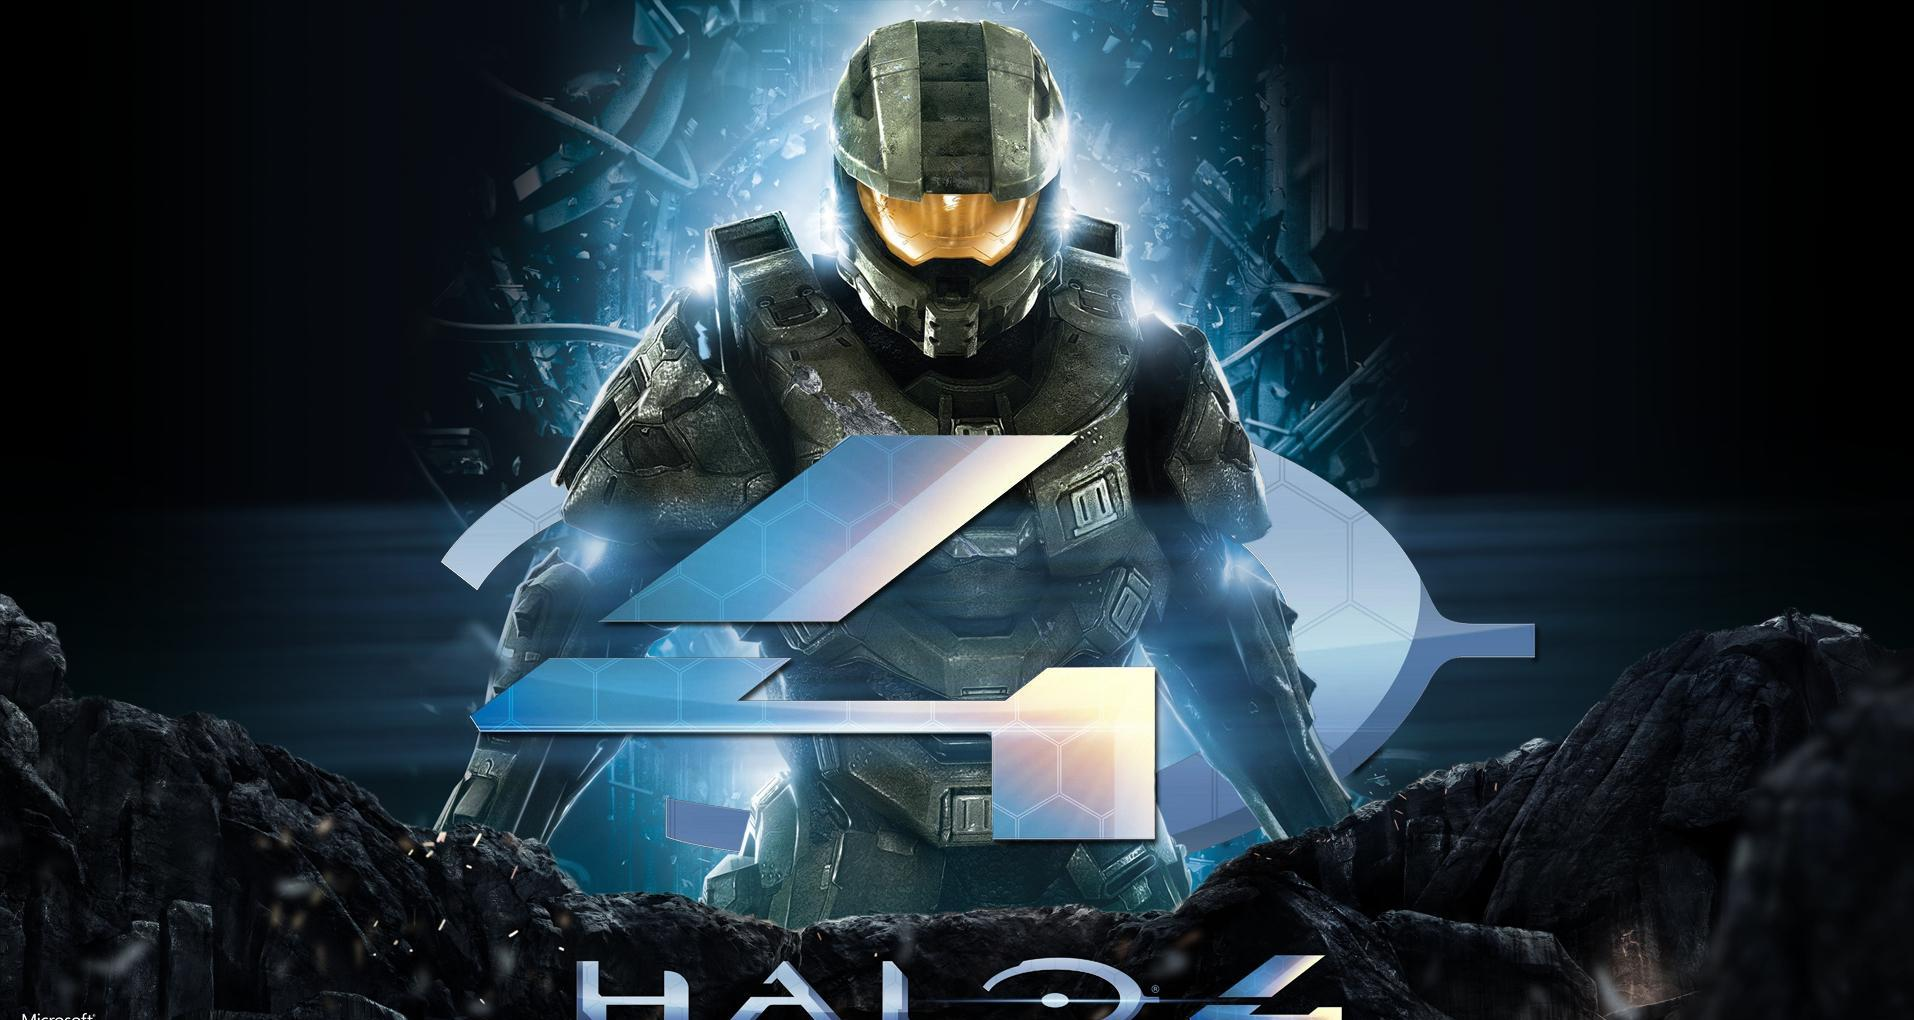 Halo 4 Wallpaper HD  Download 4jpg 1914x1020